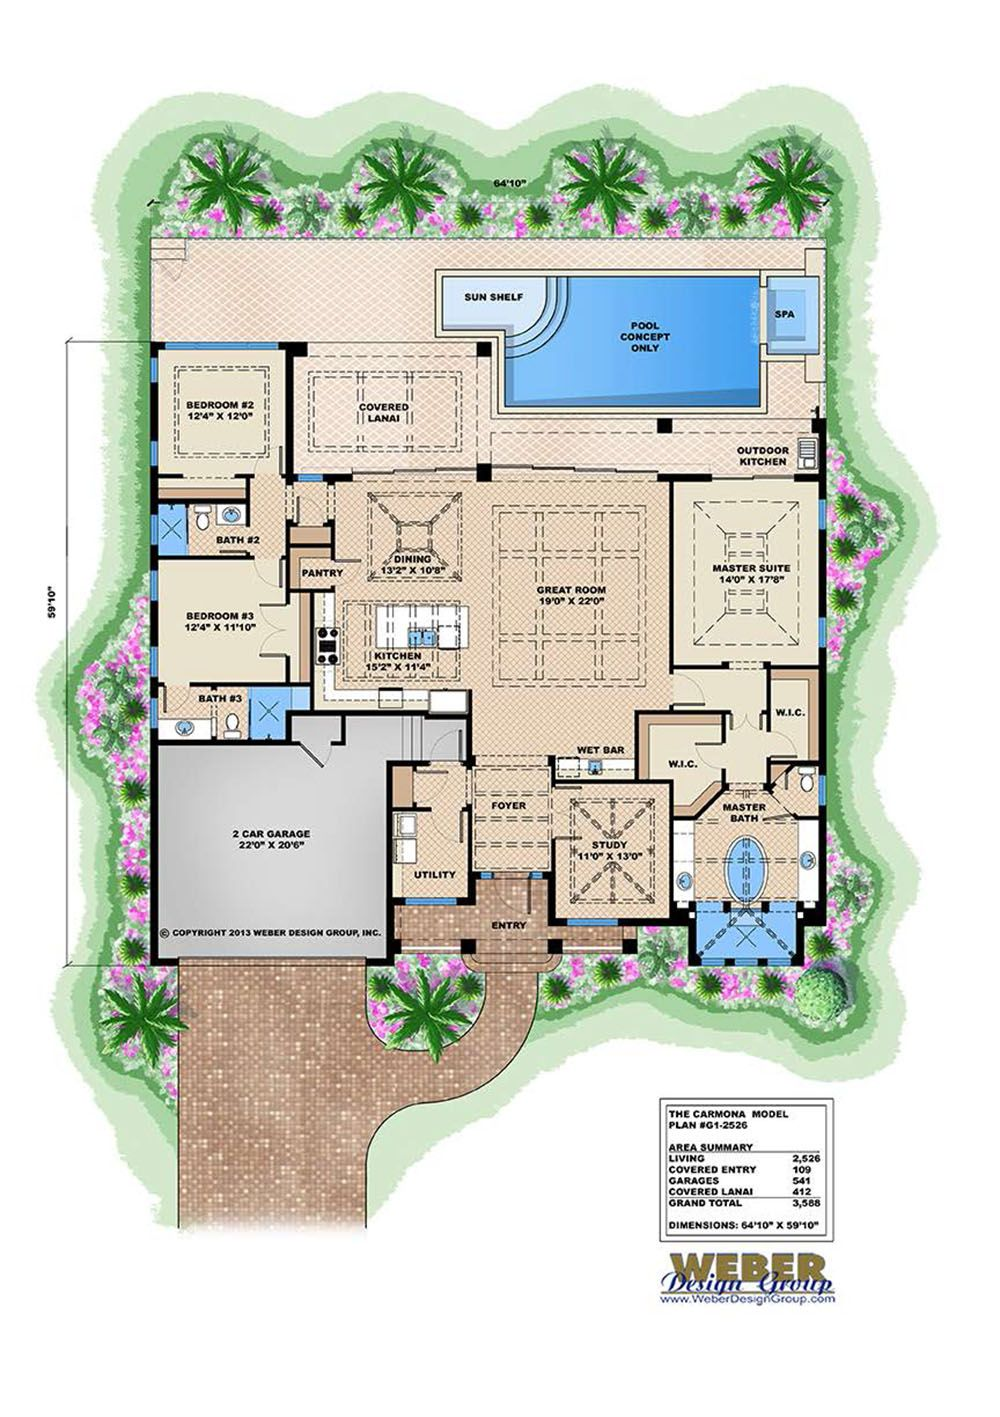 Terramar House Plan Pool house plans, Coastal house